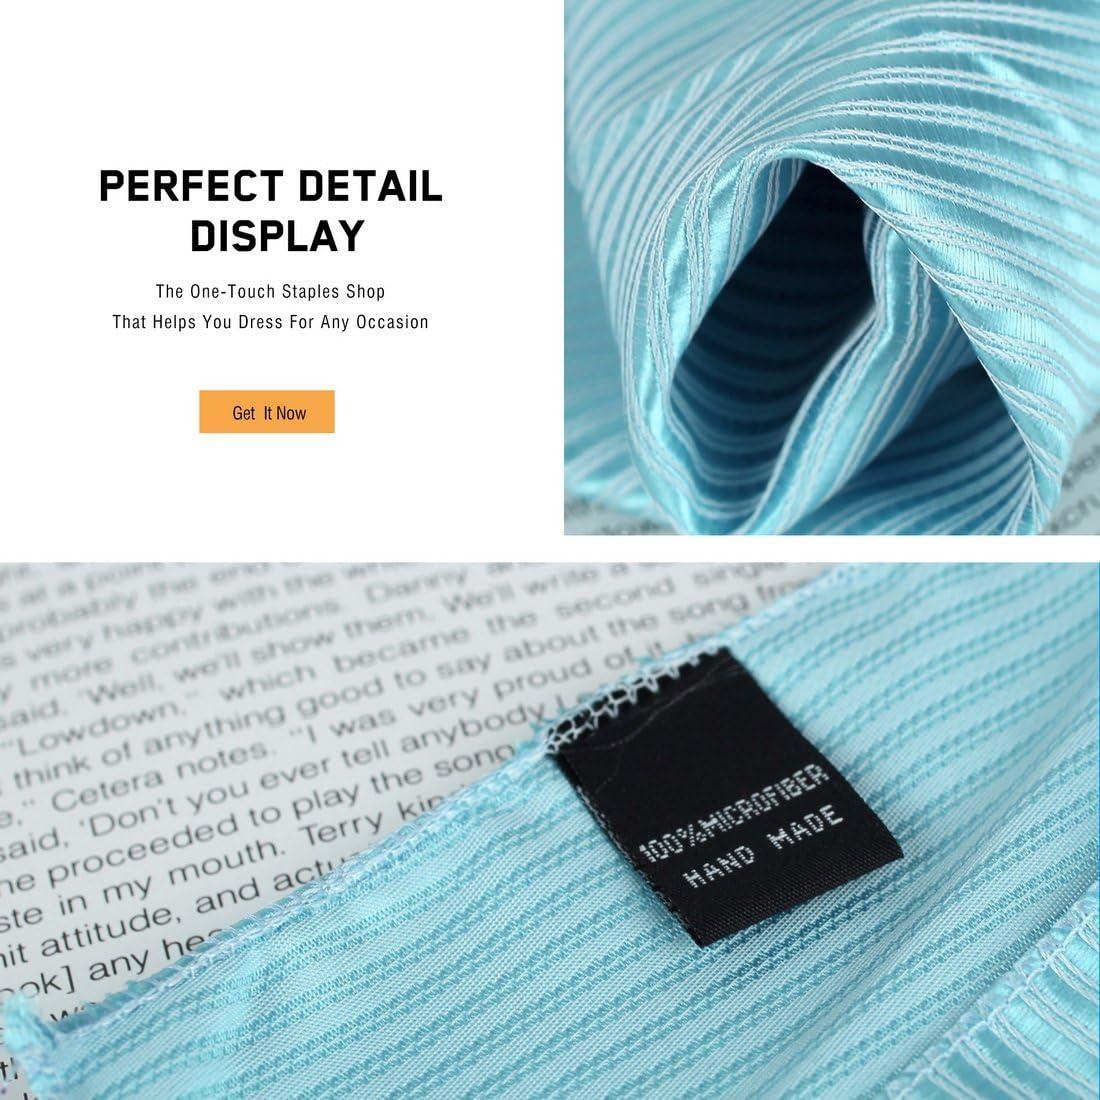 Black DEAA0001 Fashion Stripes Pocket Square For Meeting Mens Microfiber Easter Sunday Gift 3 Hankerchiefs Set White Dark Violet By Dan Smith